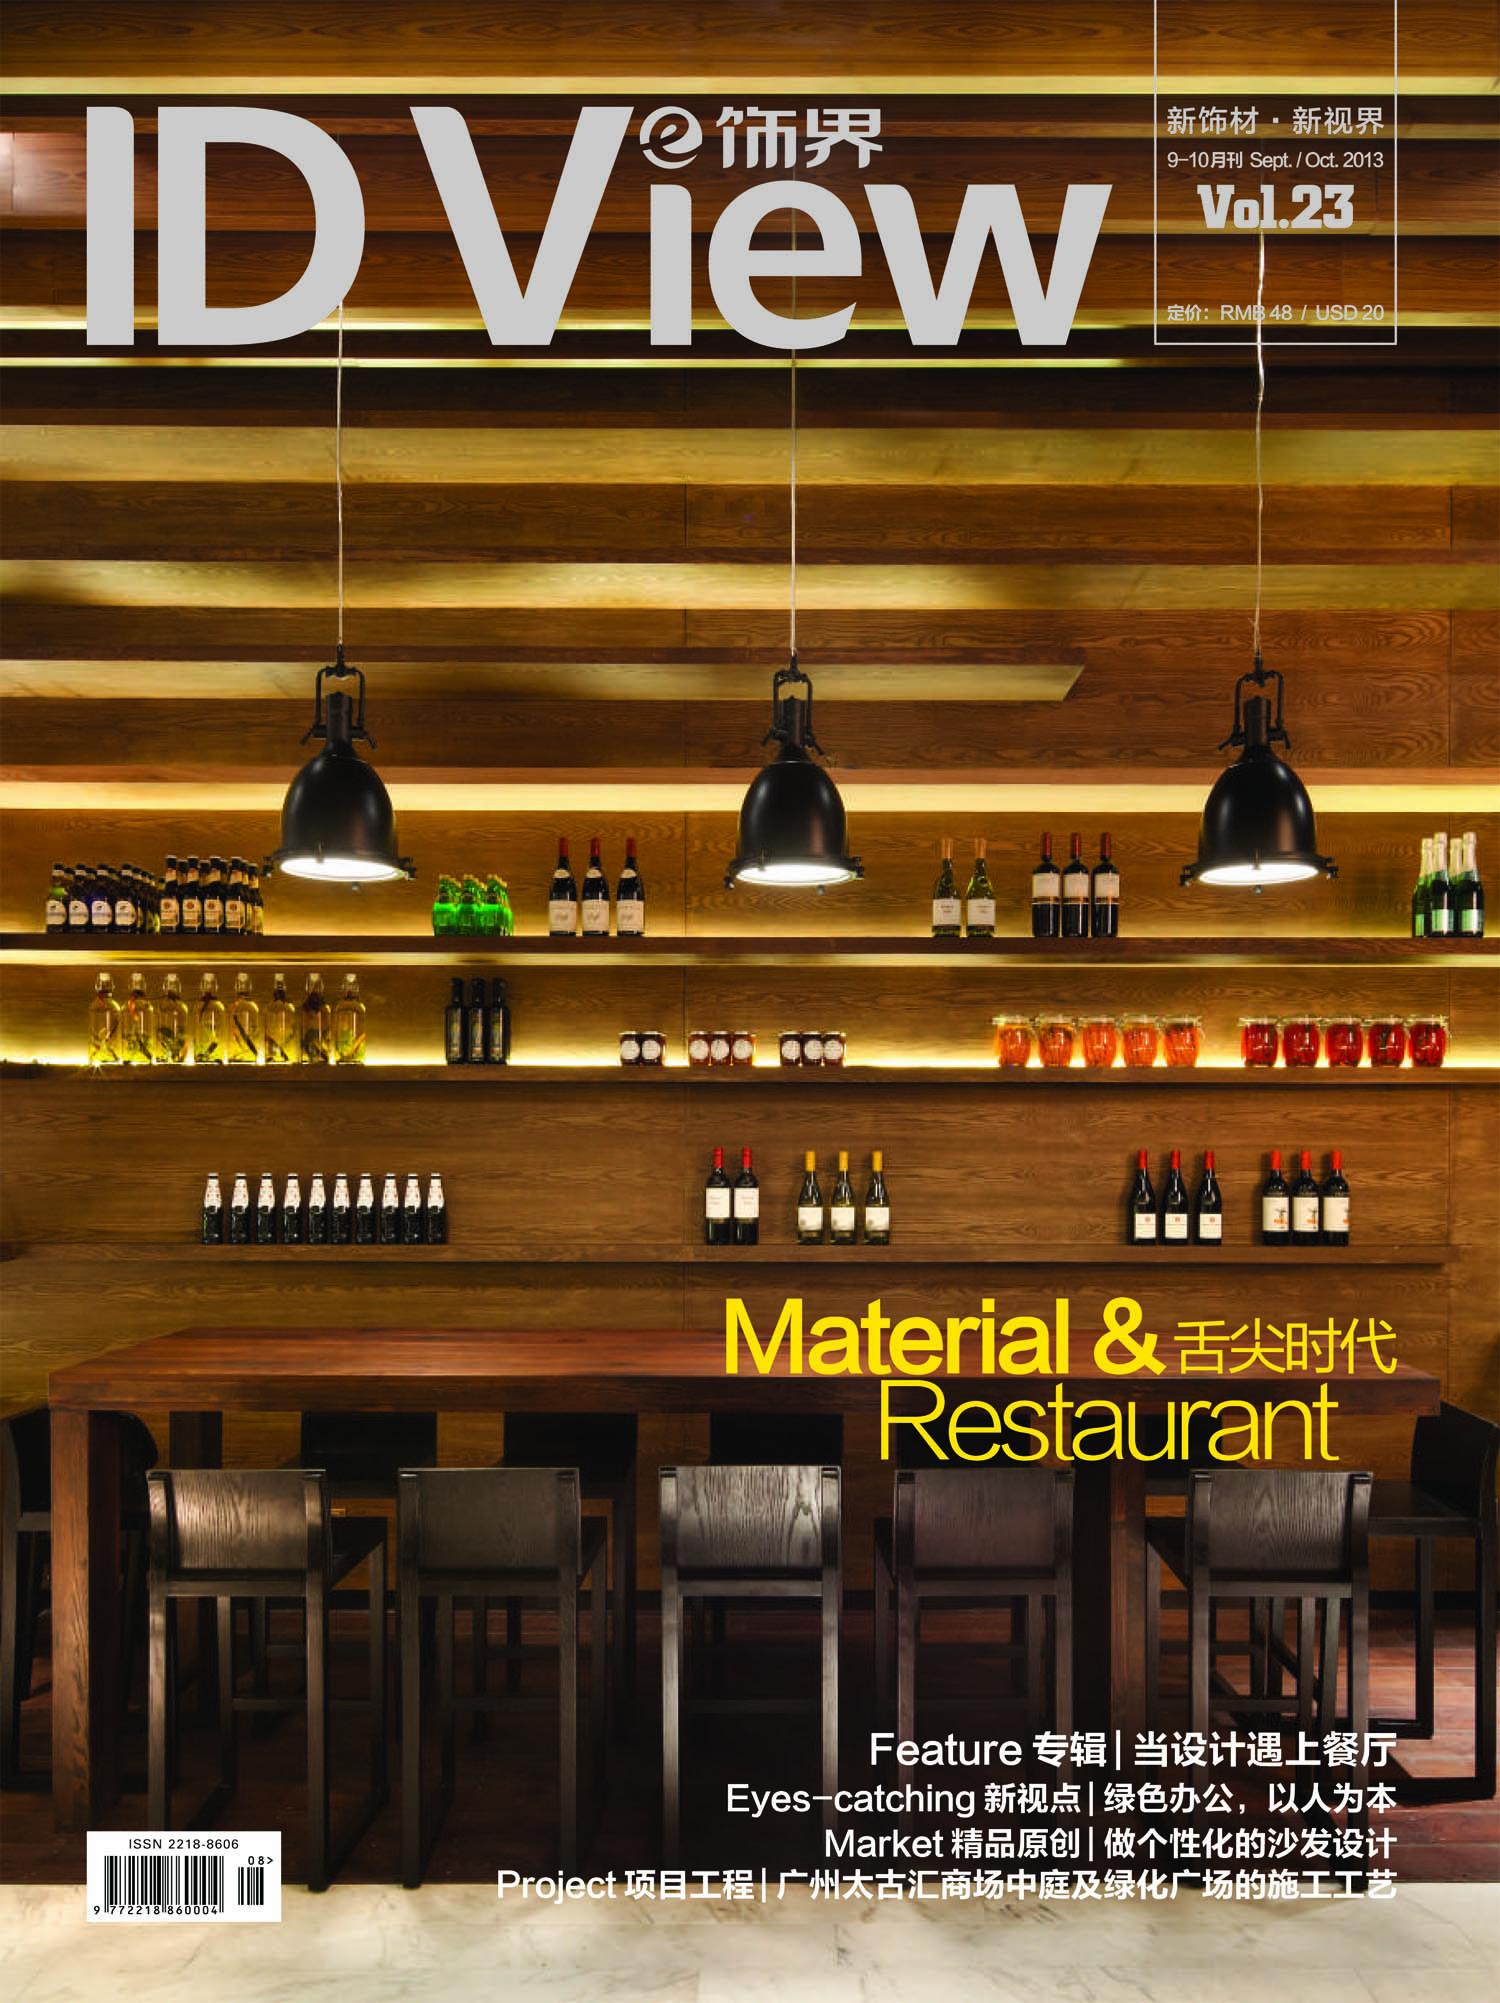 ID_View_china_Nov13-1-cover.jpg